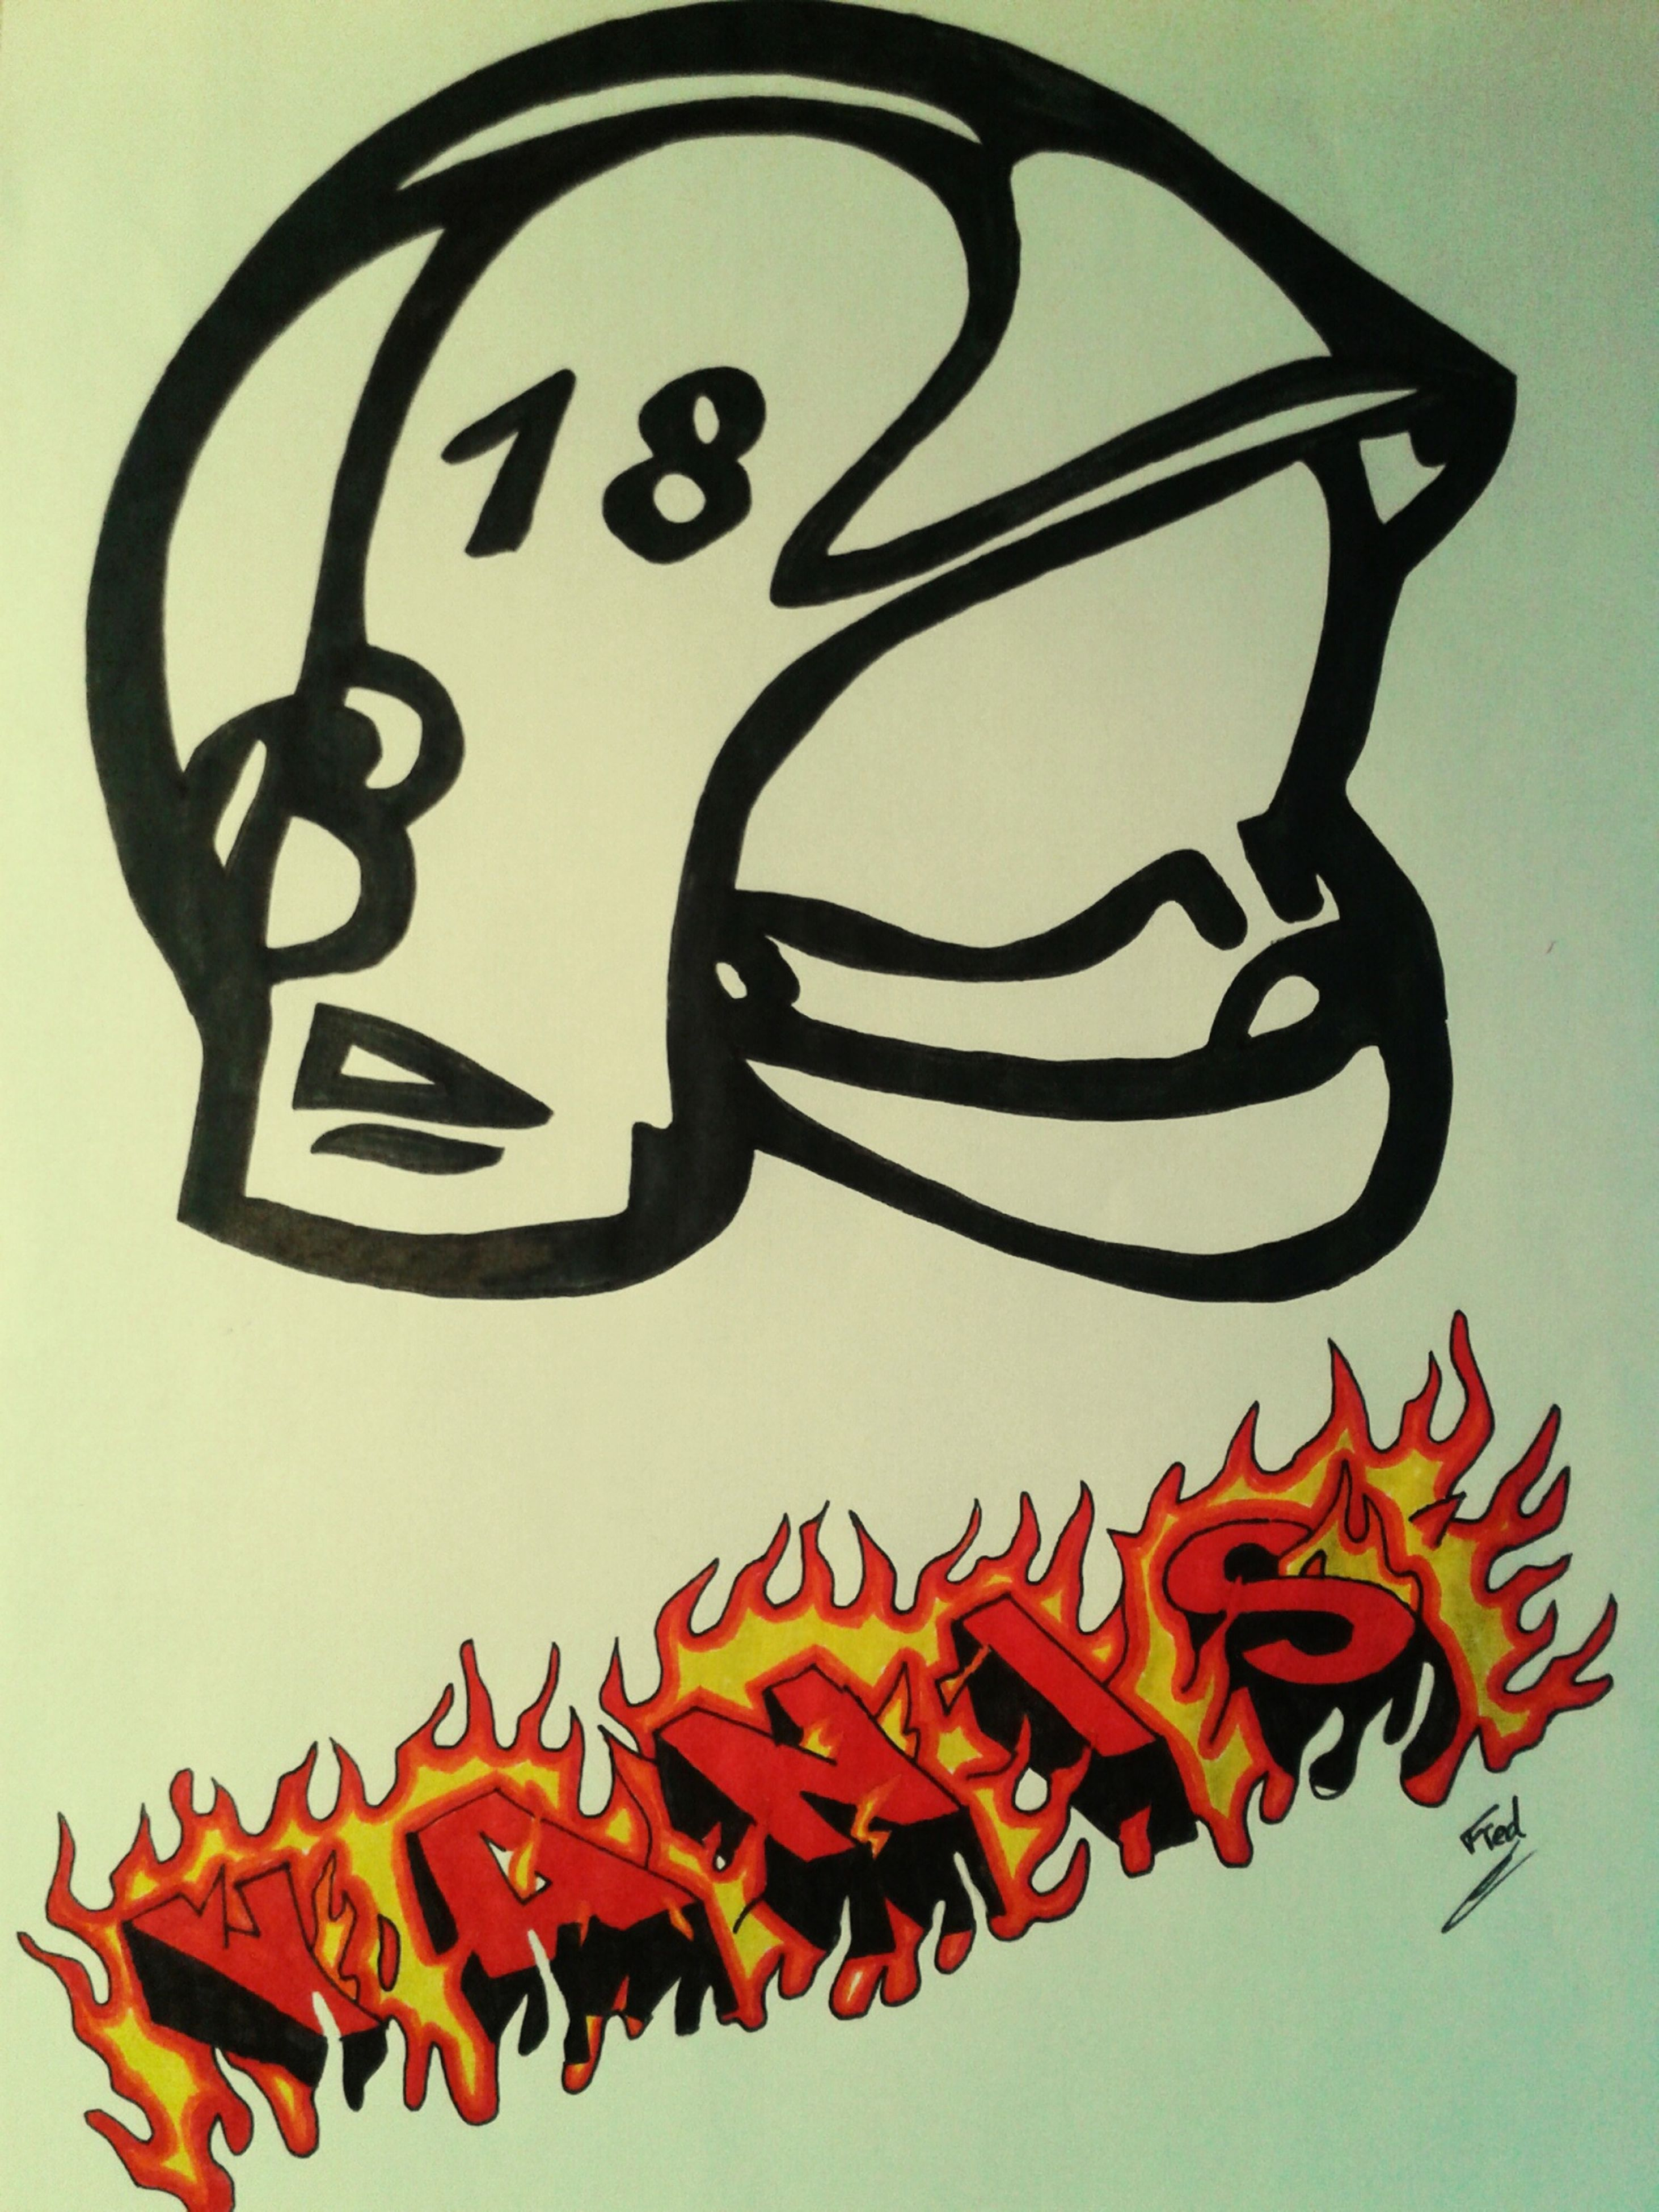 art and craft, creativity, art, close-up, text, studio shot, human representation, animal representation, indoors, craft, western script, decoration, still life, design, heart shape, paper, communication, orange color, no people